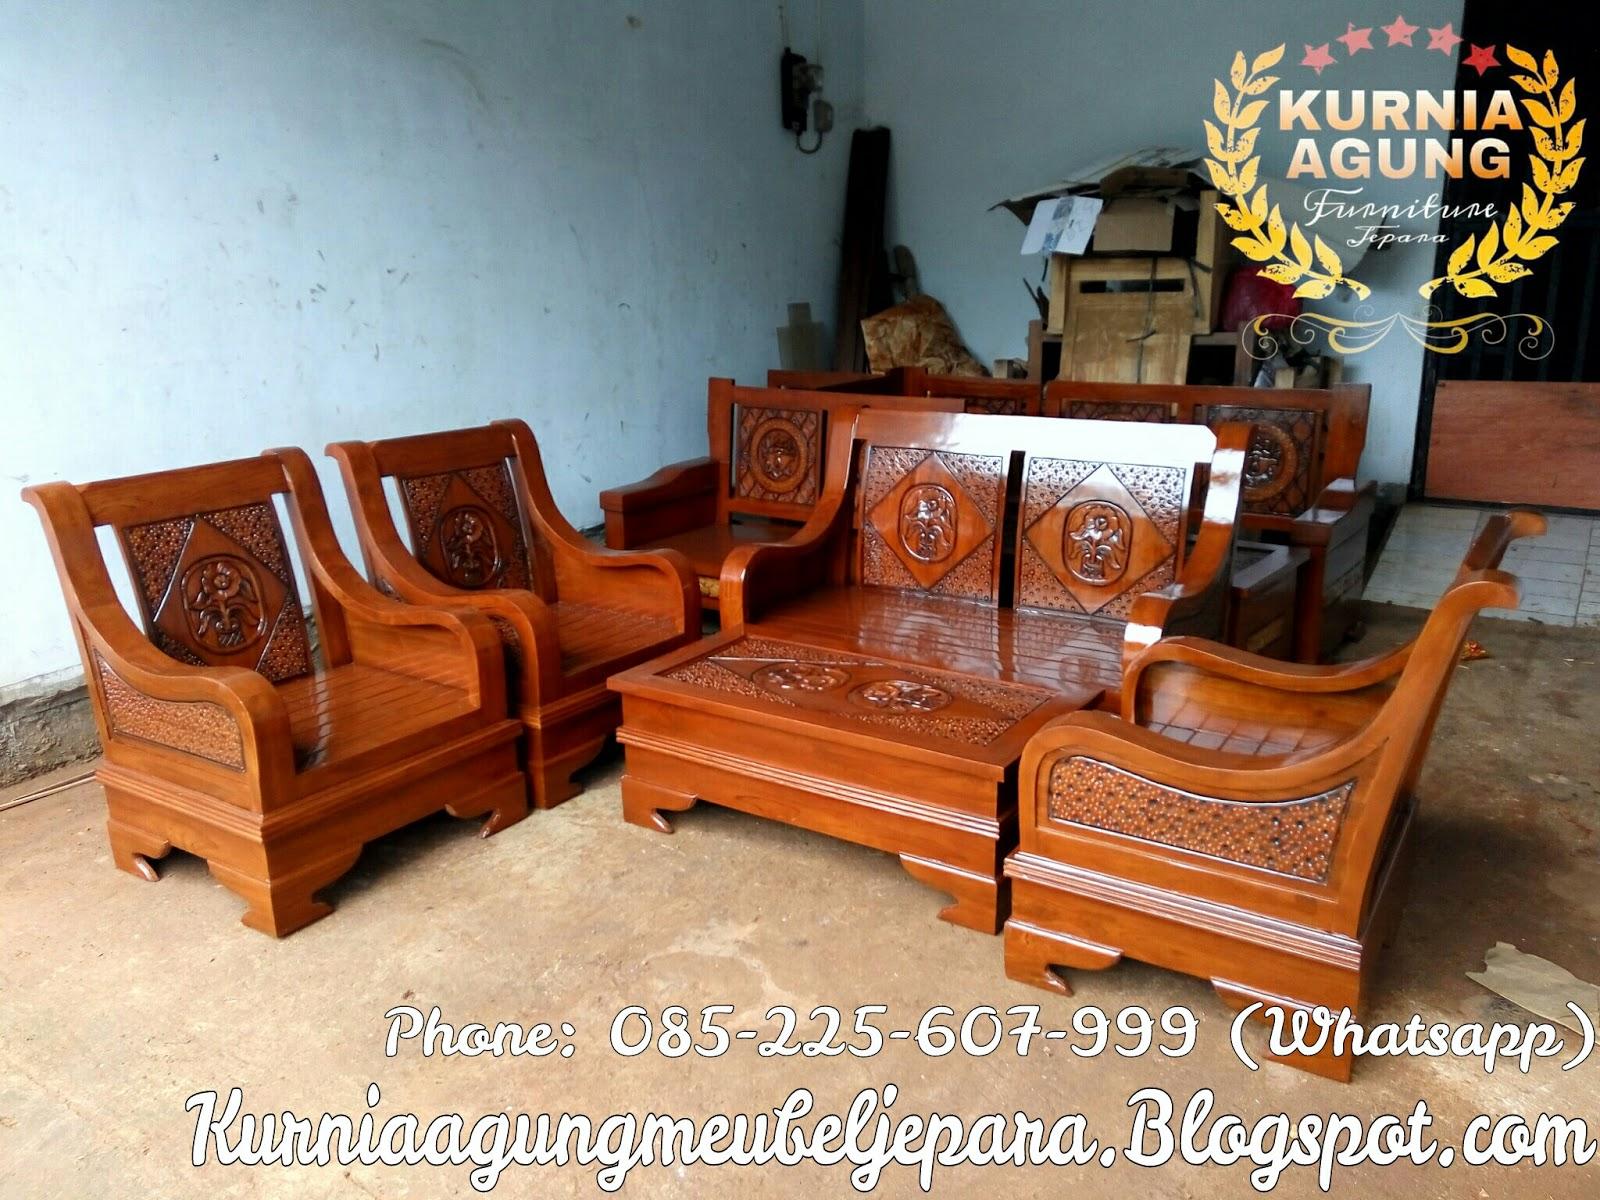 KAKurnia Agung Meubel Jepara Desember 2016